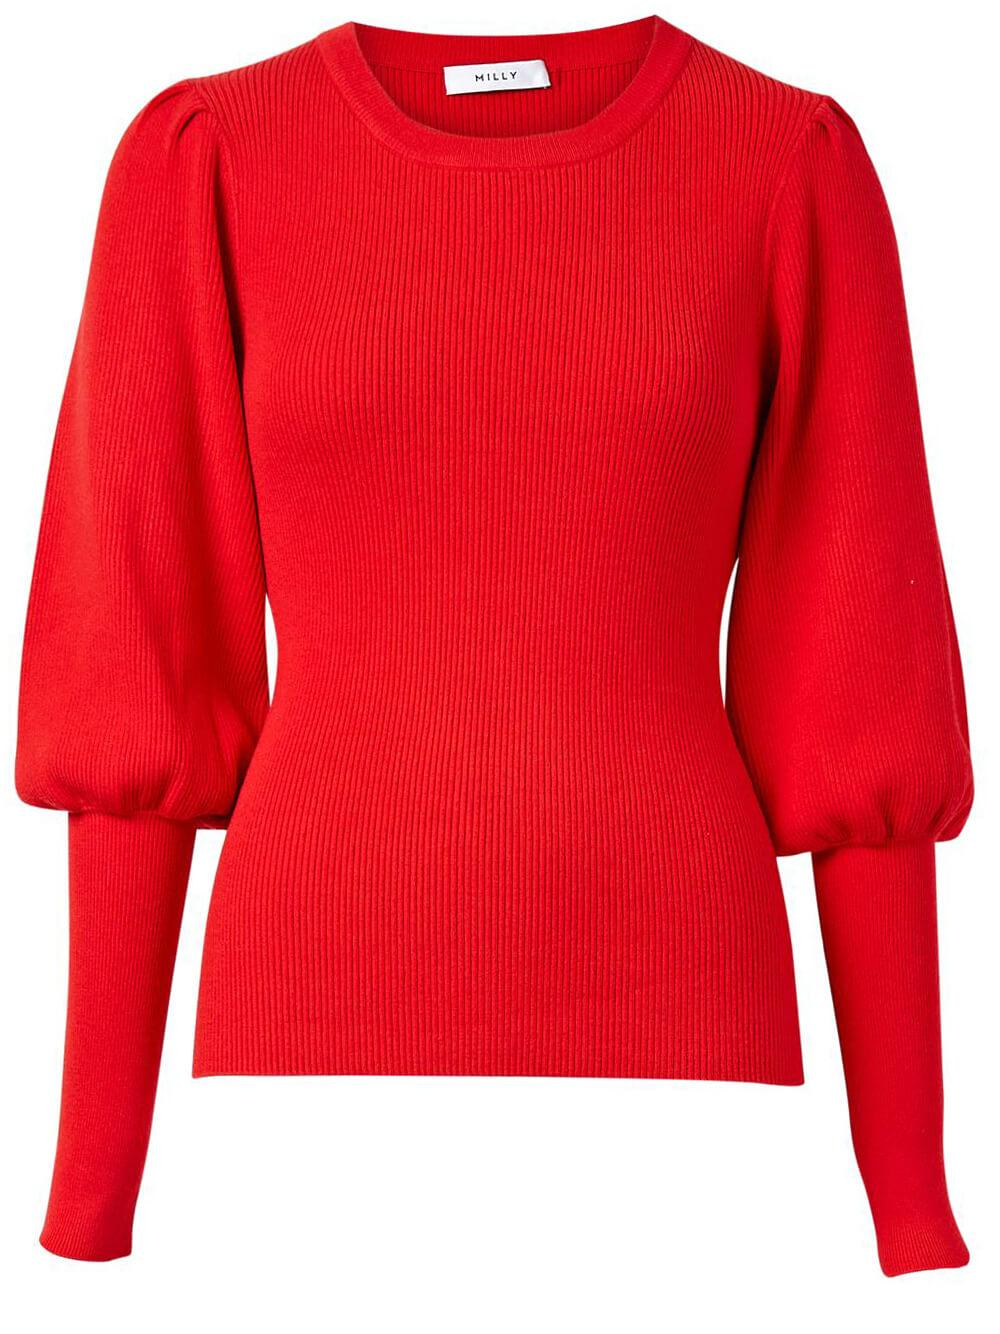 Poof Sleeve Sweater Item # KRT028